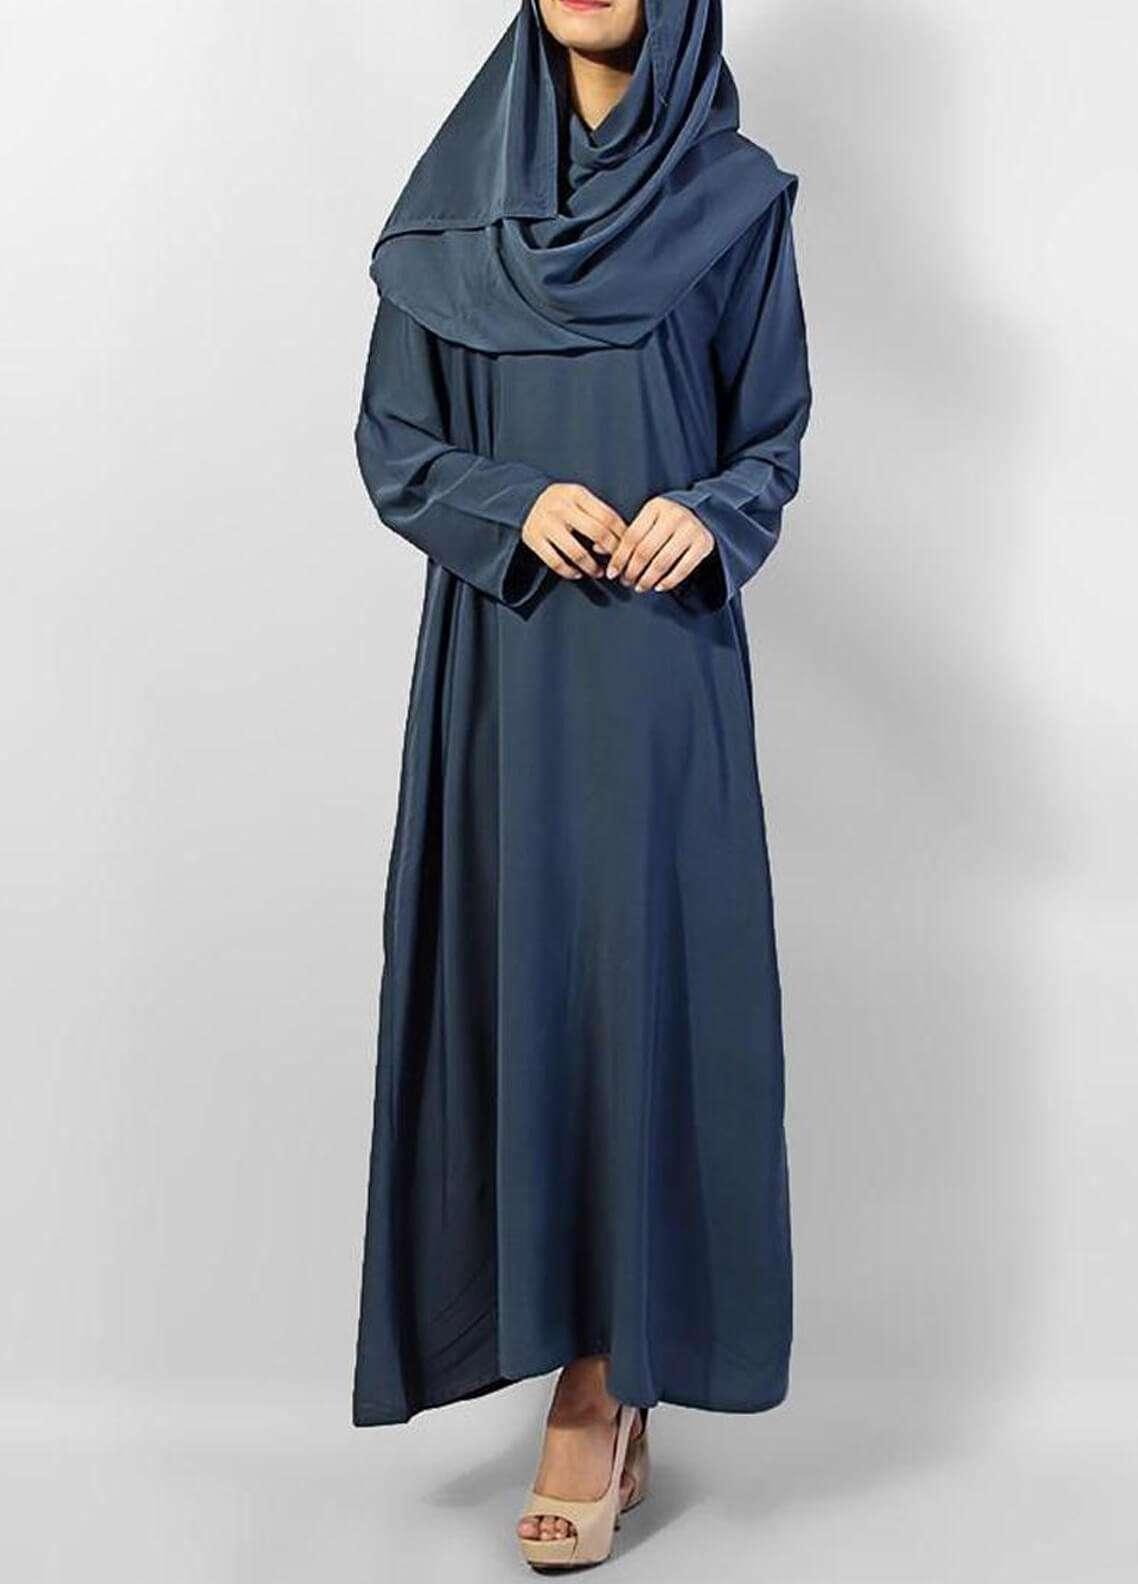 Hijab ul Hareem  Abayas Designered Pull Over Abaya 0120-P (1)